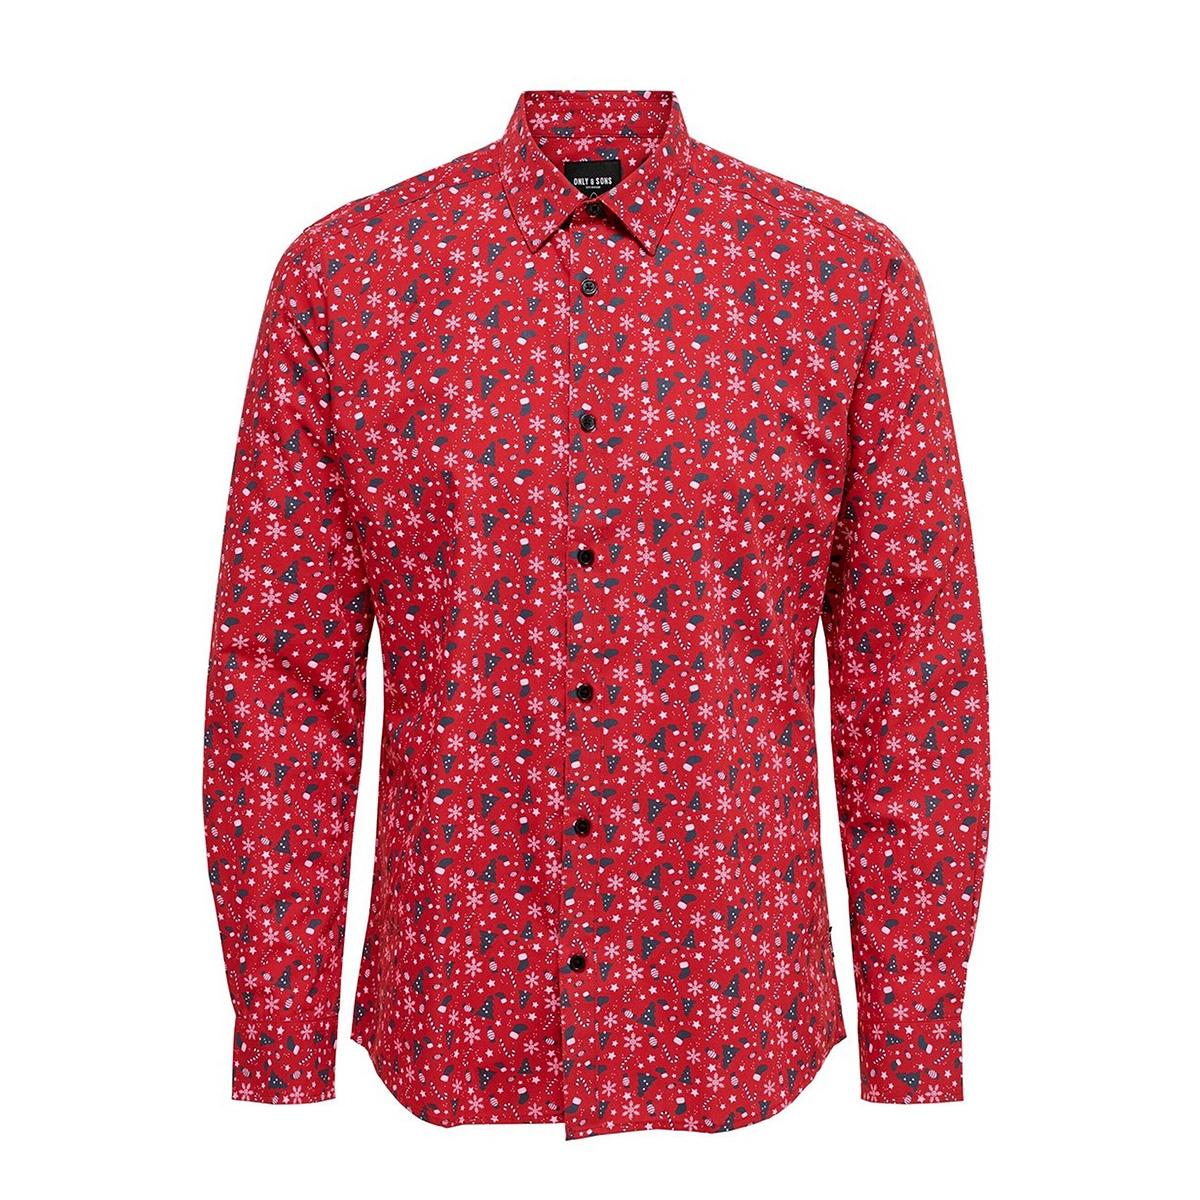 onselham ls x-mas aop shirt 22014547 jack & jones overhemd pompeian red